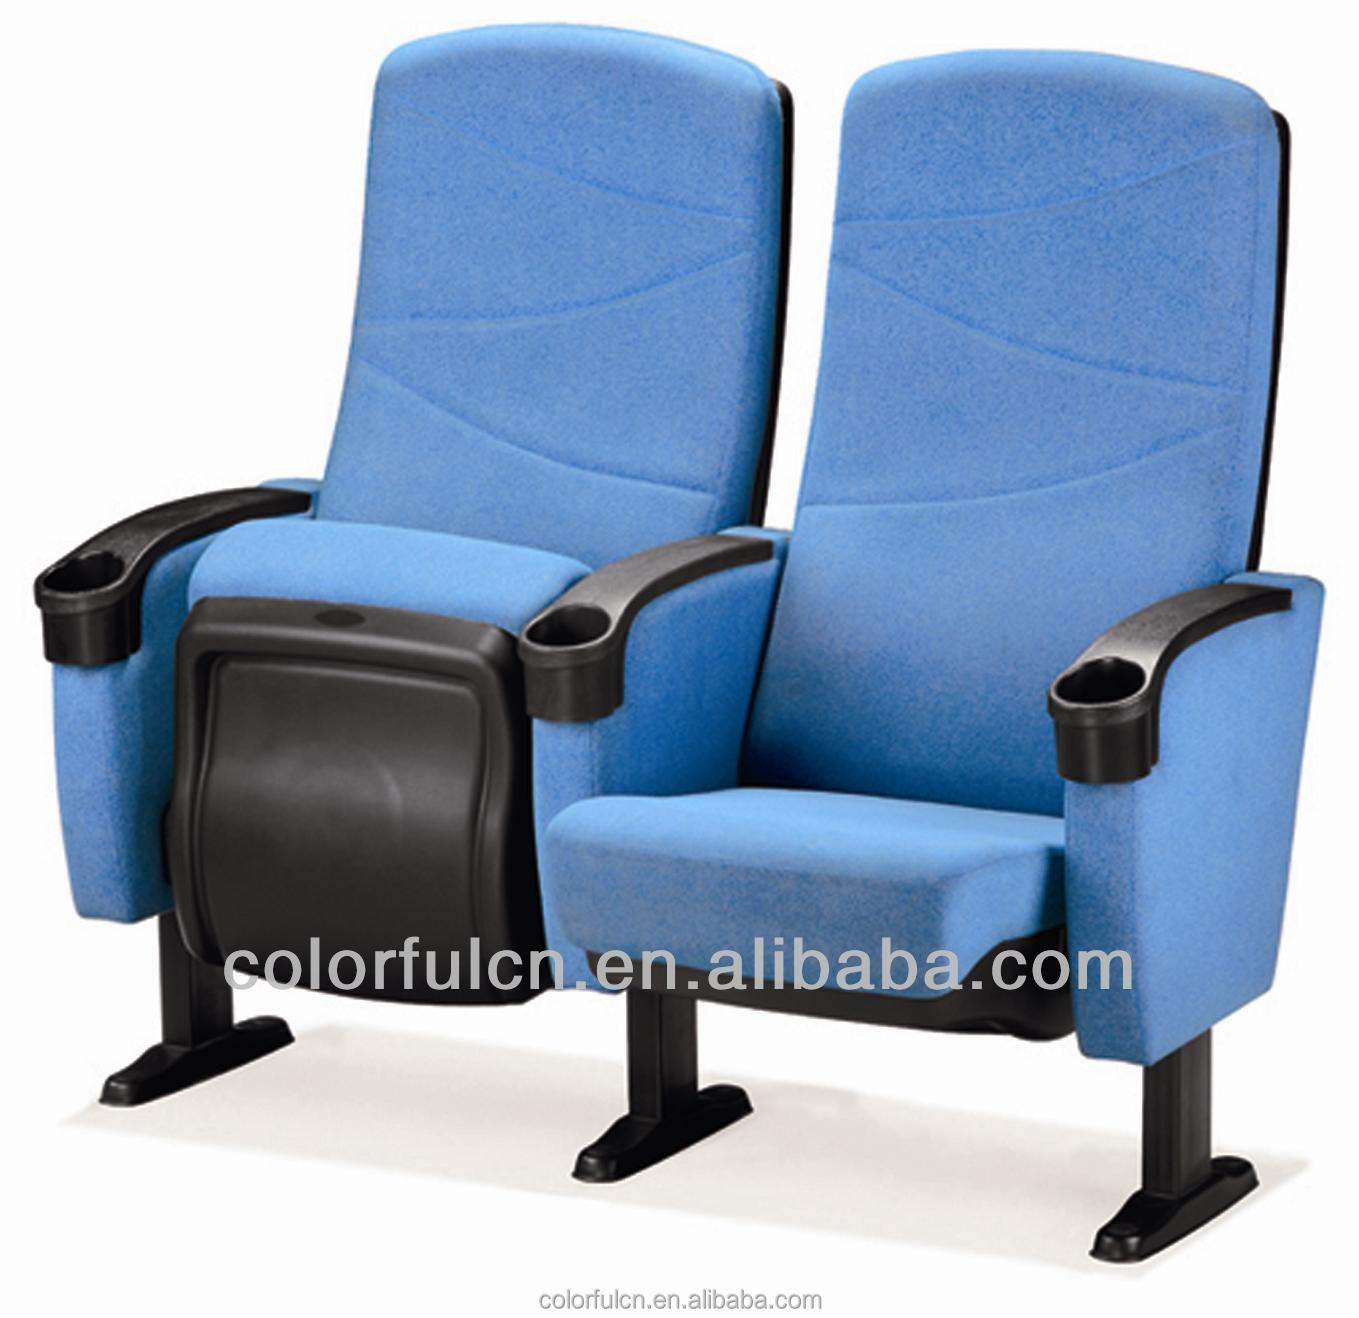 Home Theater Chair 5d Model Cinema Chair ya 240 Buy